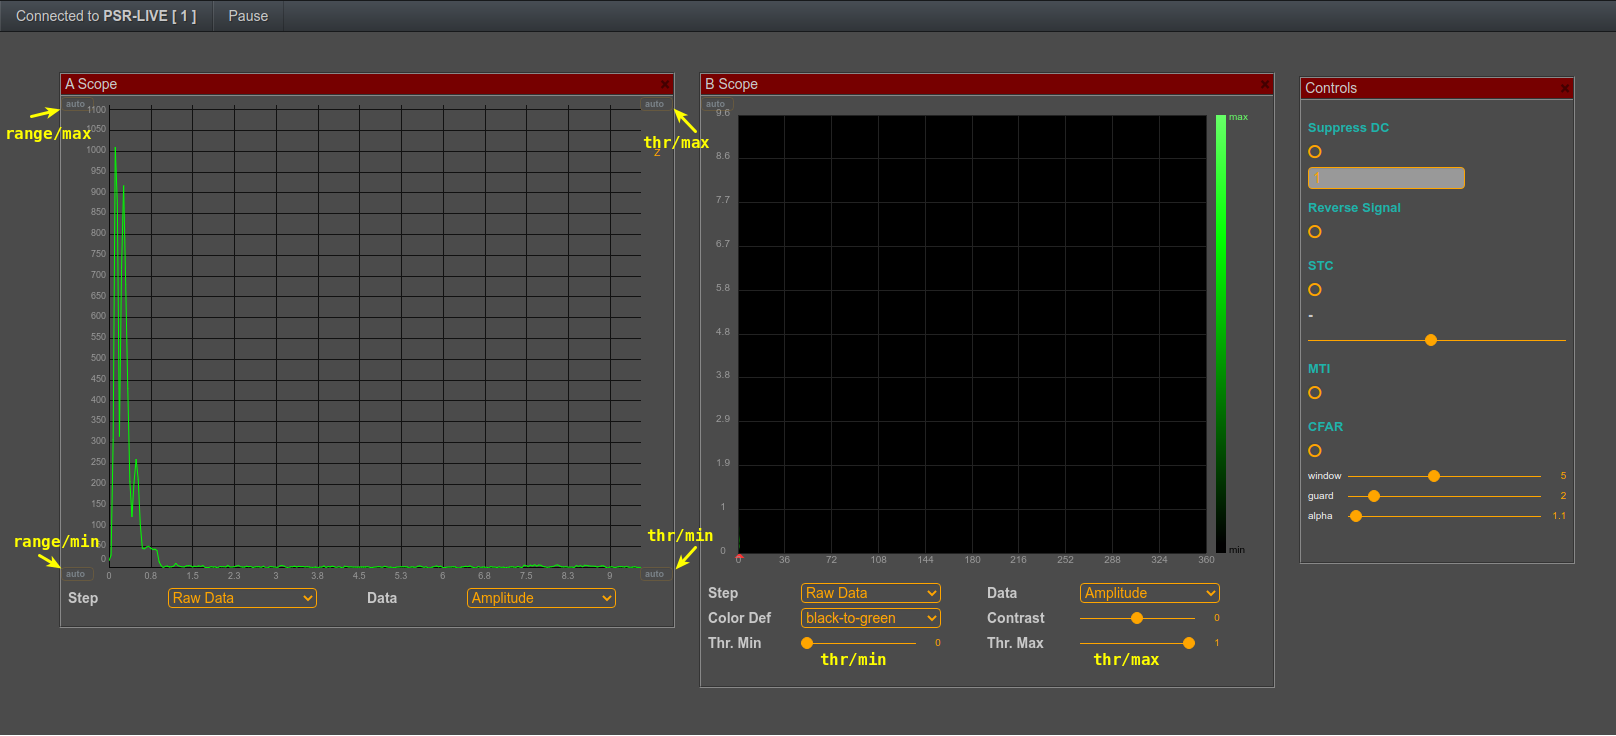 setting maximum and minimum range as well as maximum and minimum theshold in FreeScopes for Pulse and Doppler radars